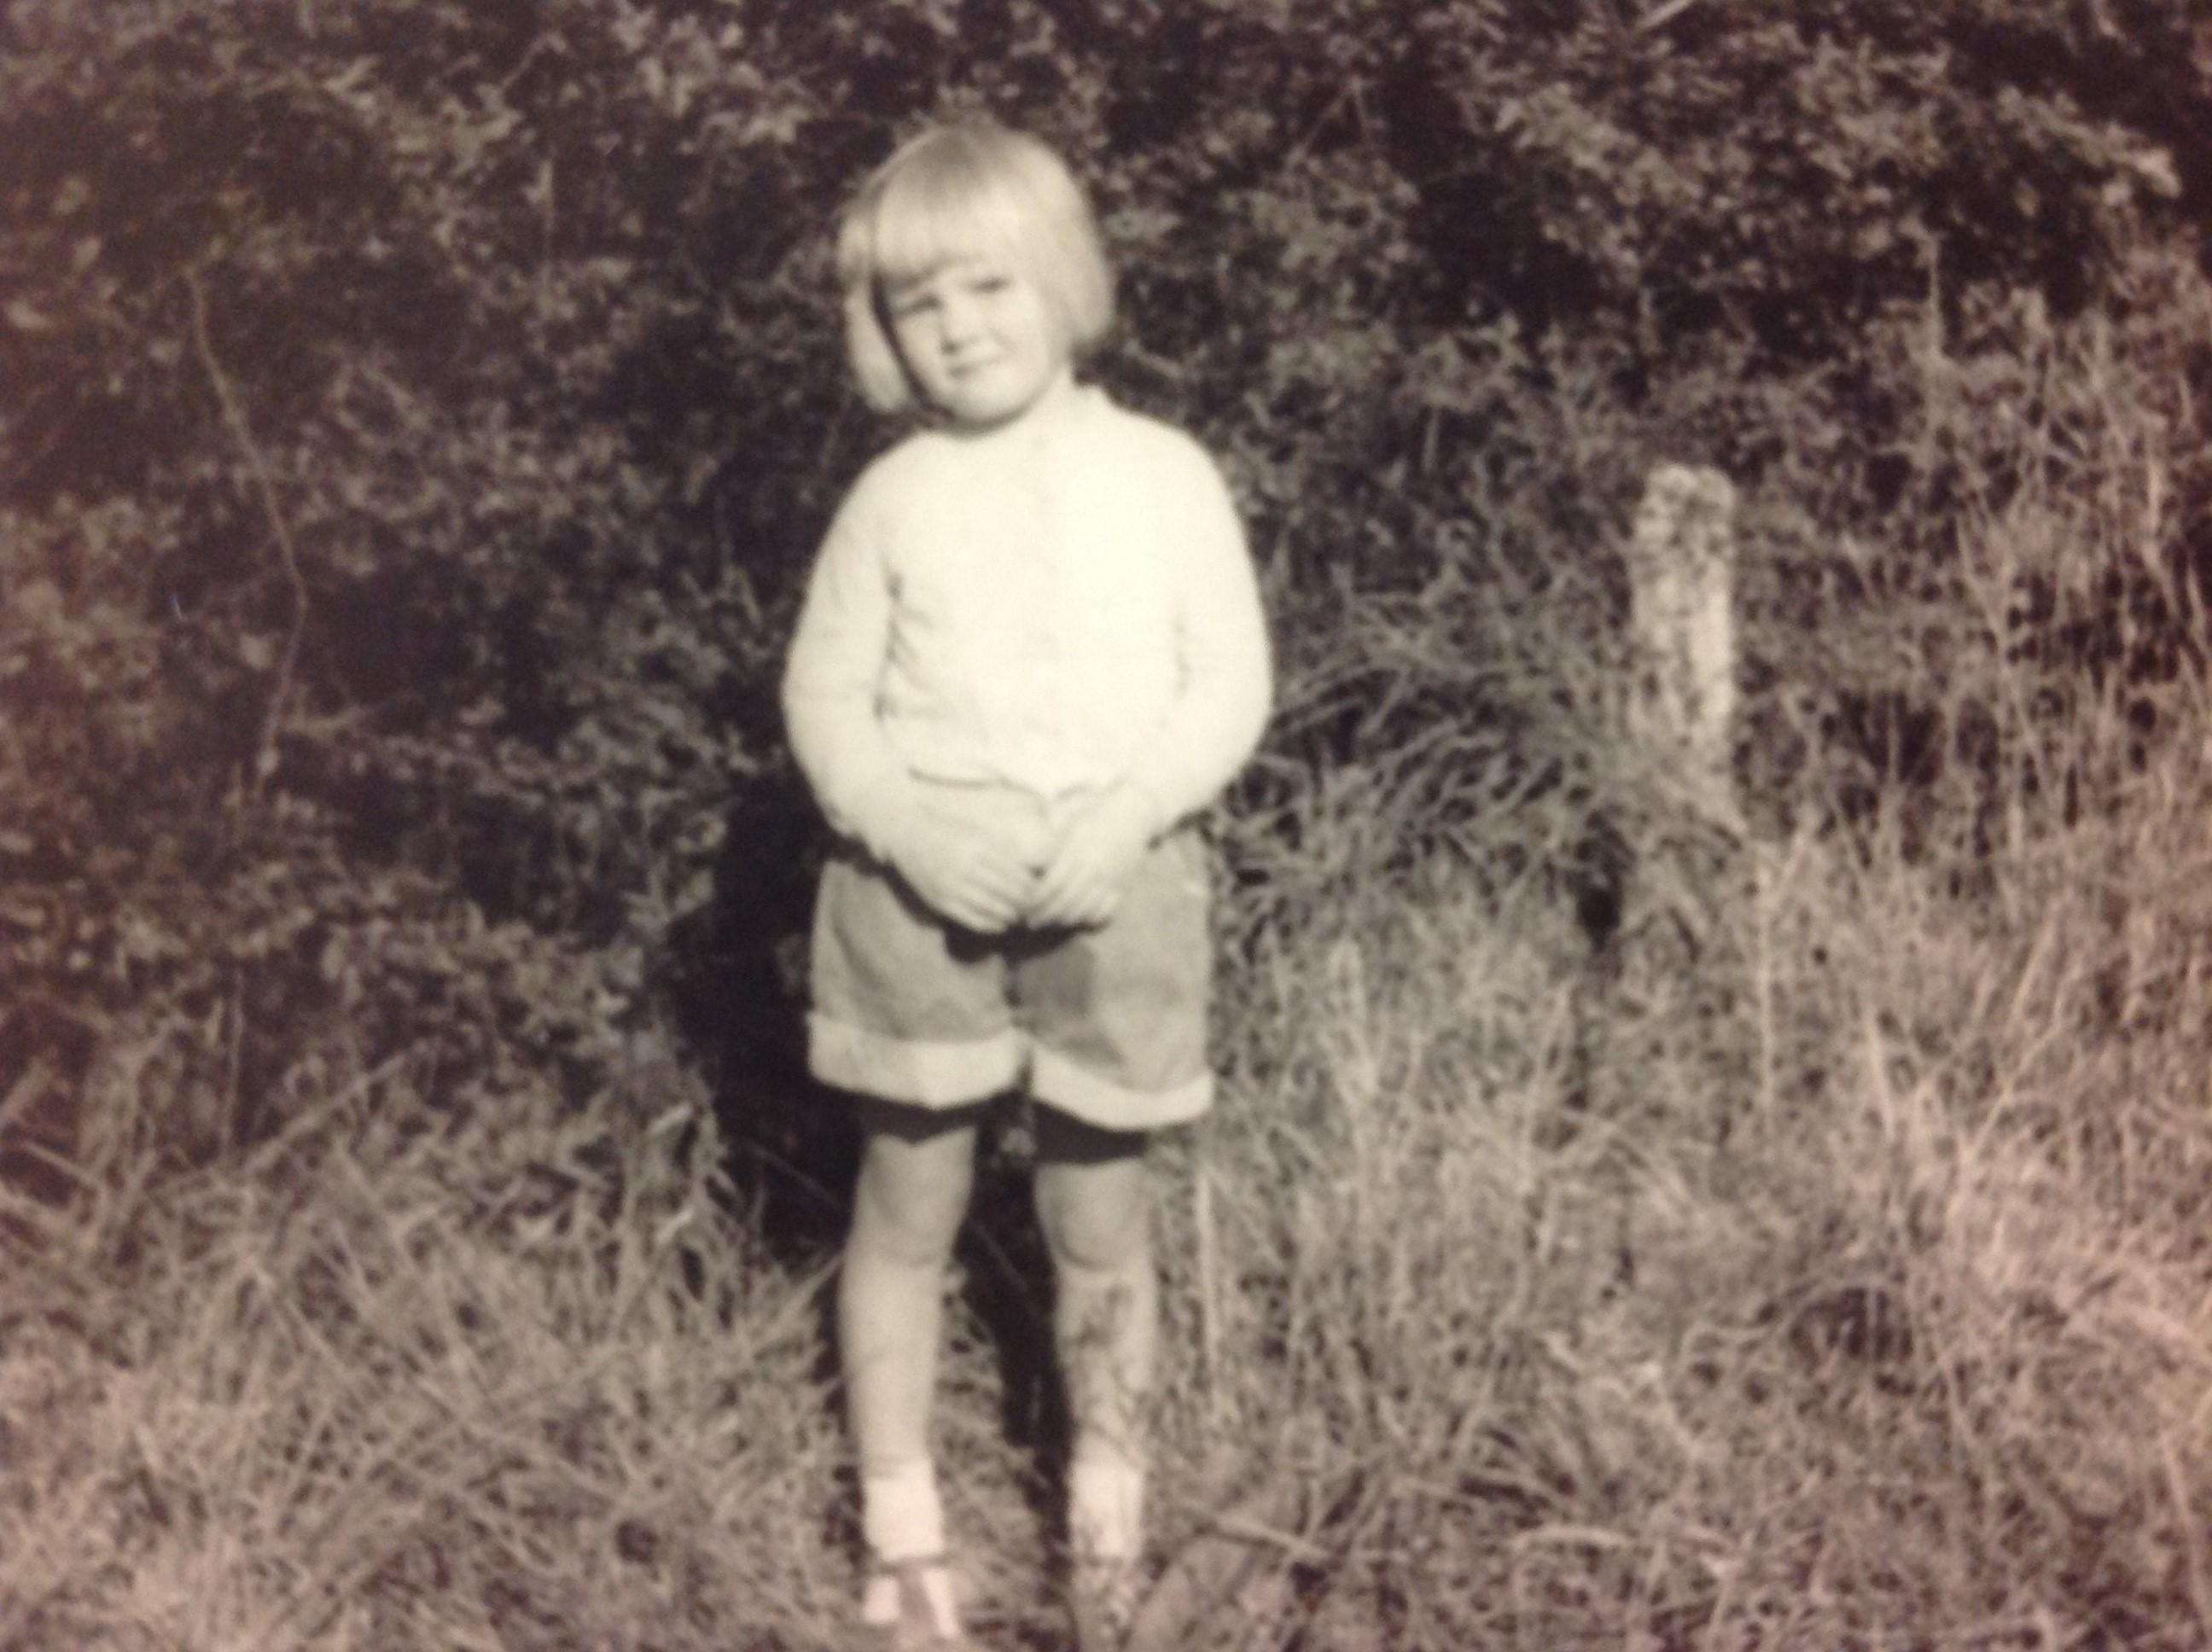 me wearing shorts in garden